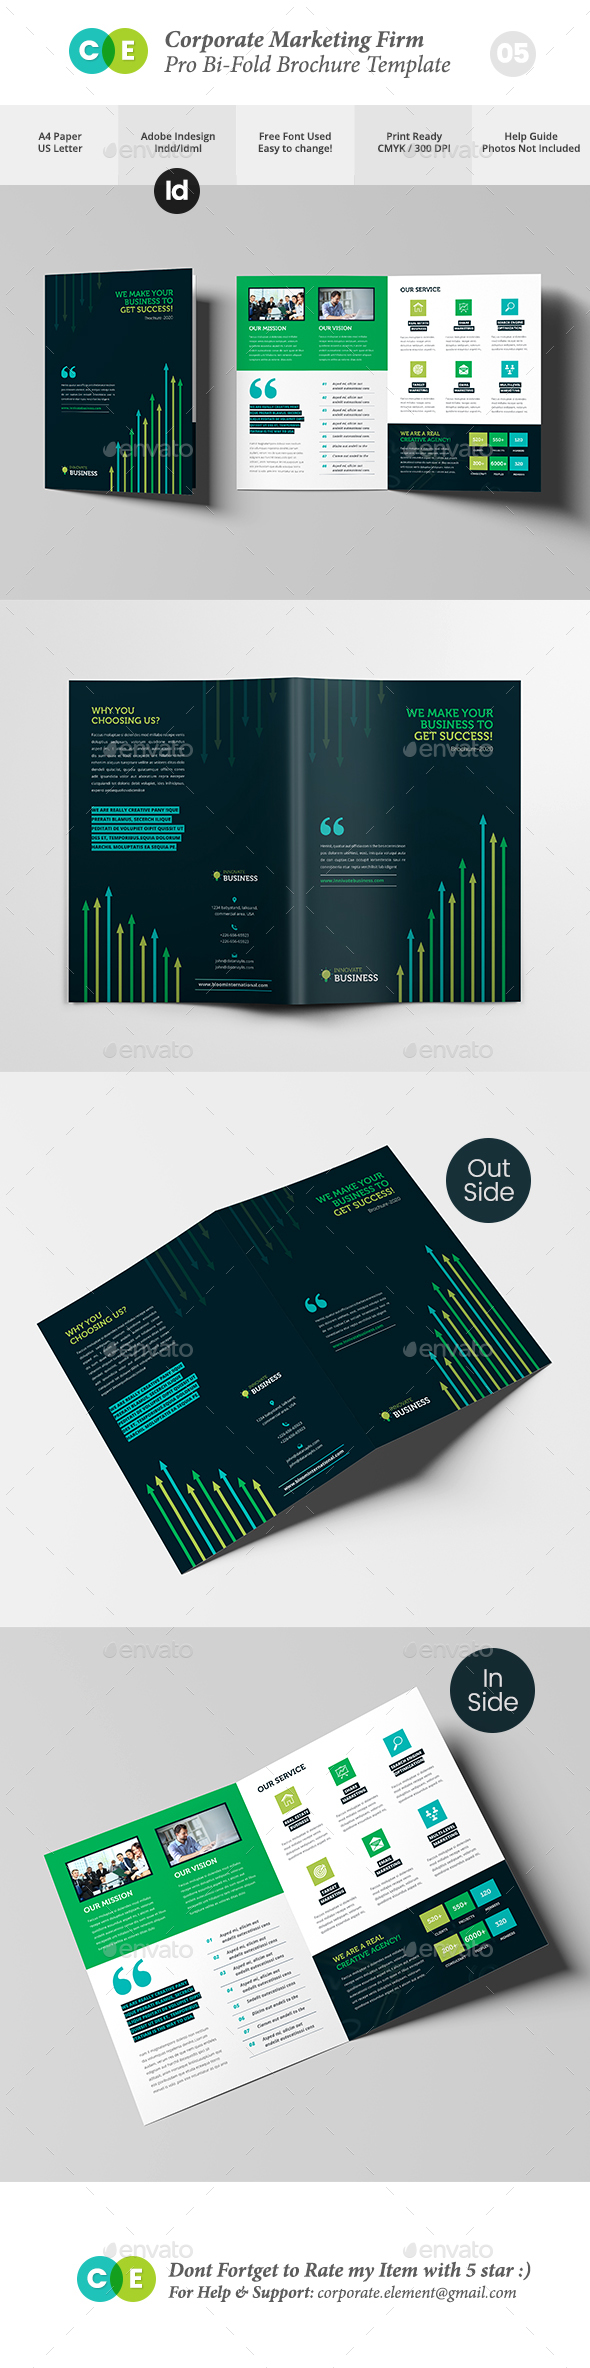 Corporate Marketing Firm Pro Bi-Fold Brochure V05 - Brochures Print Templates